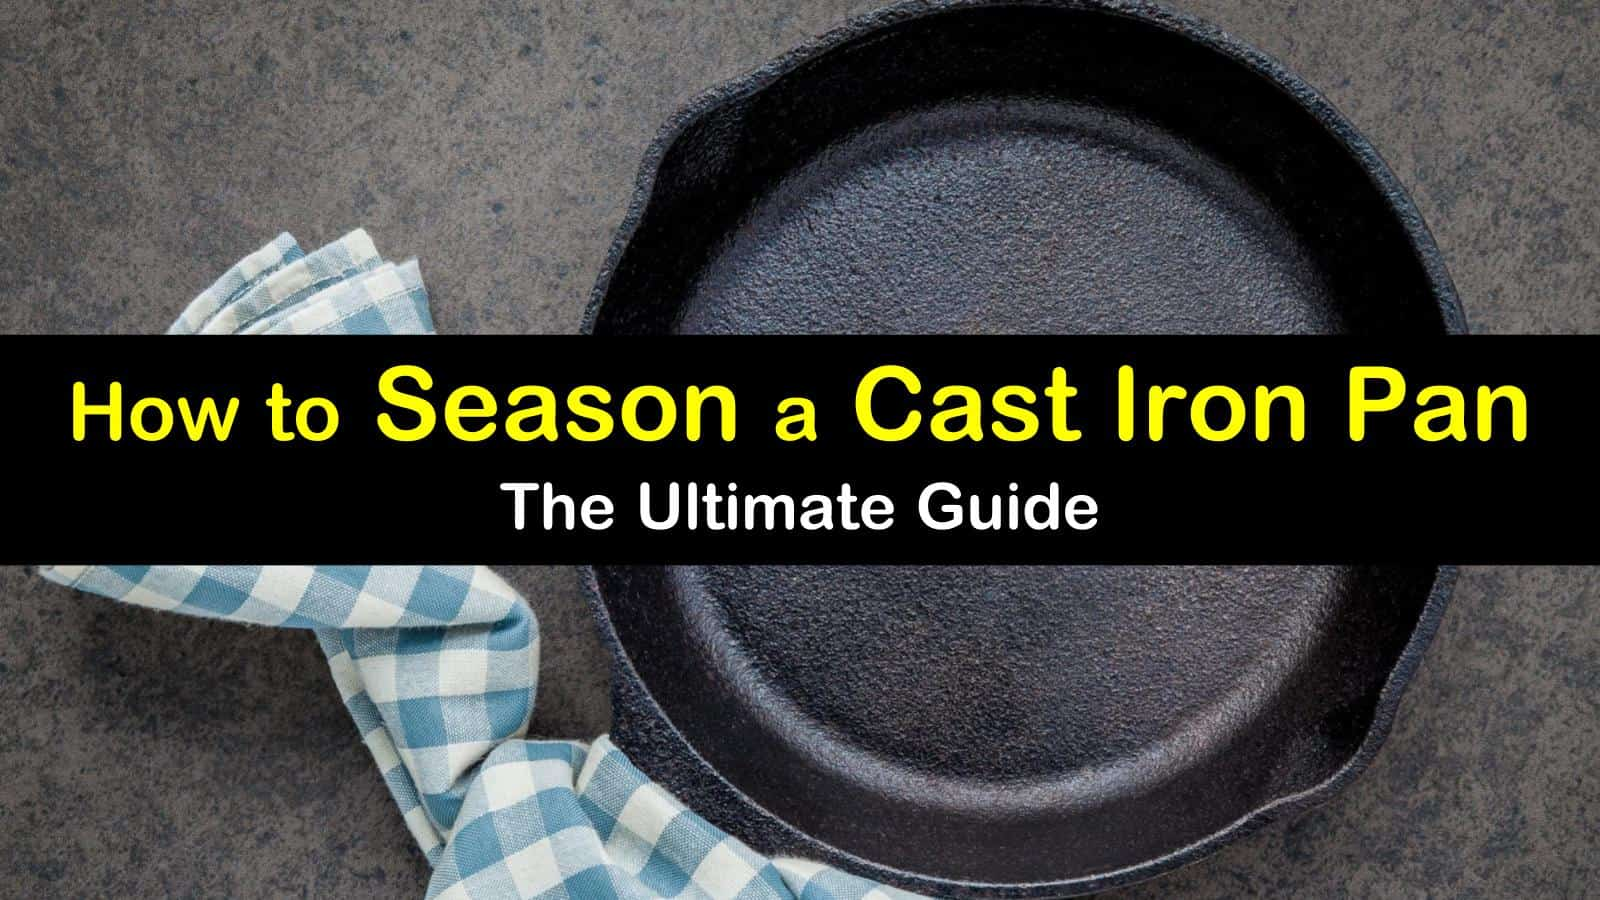 how to season a cast iron pan titleimg1